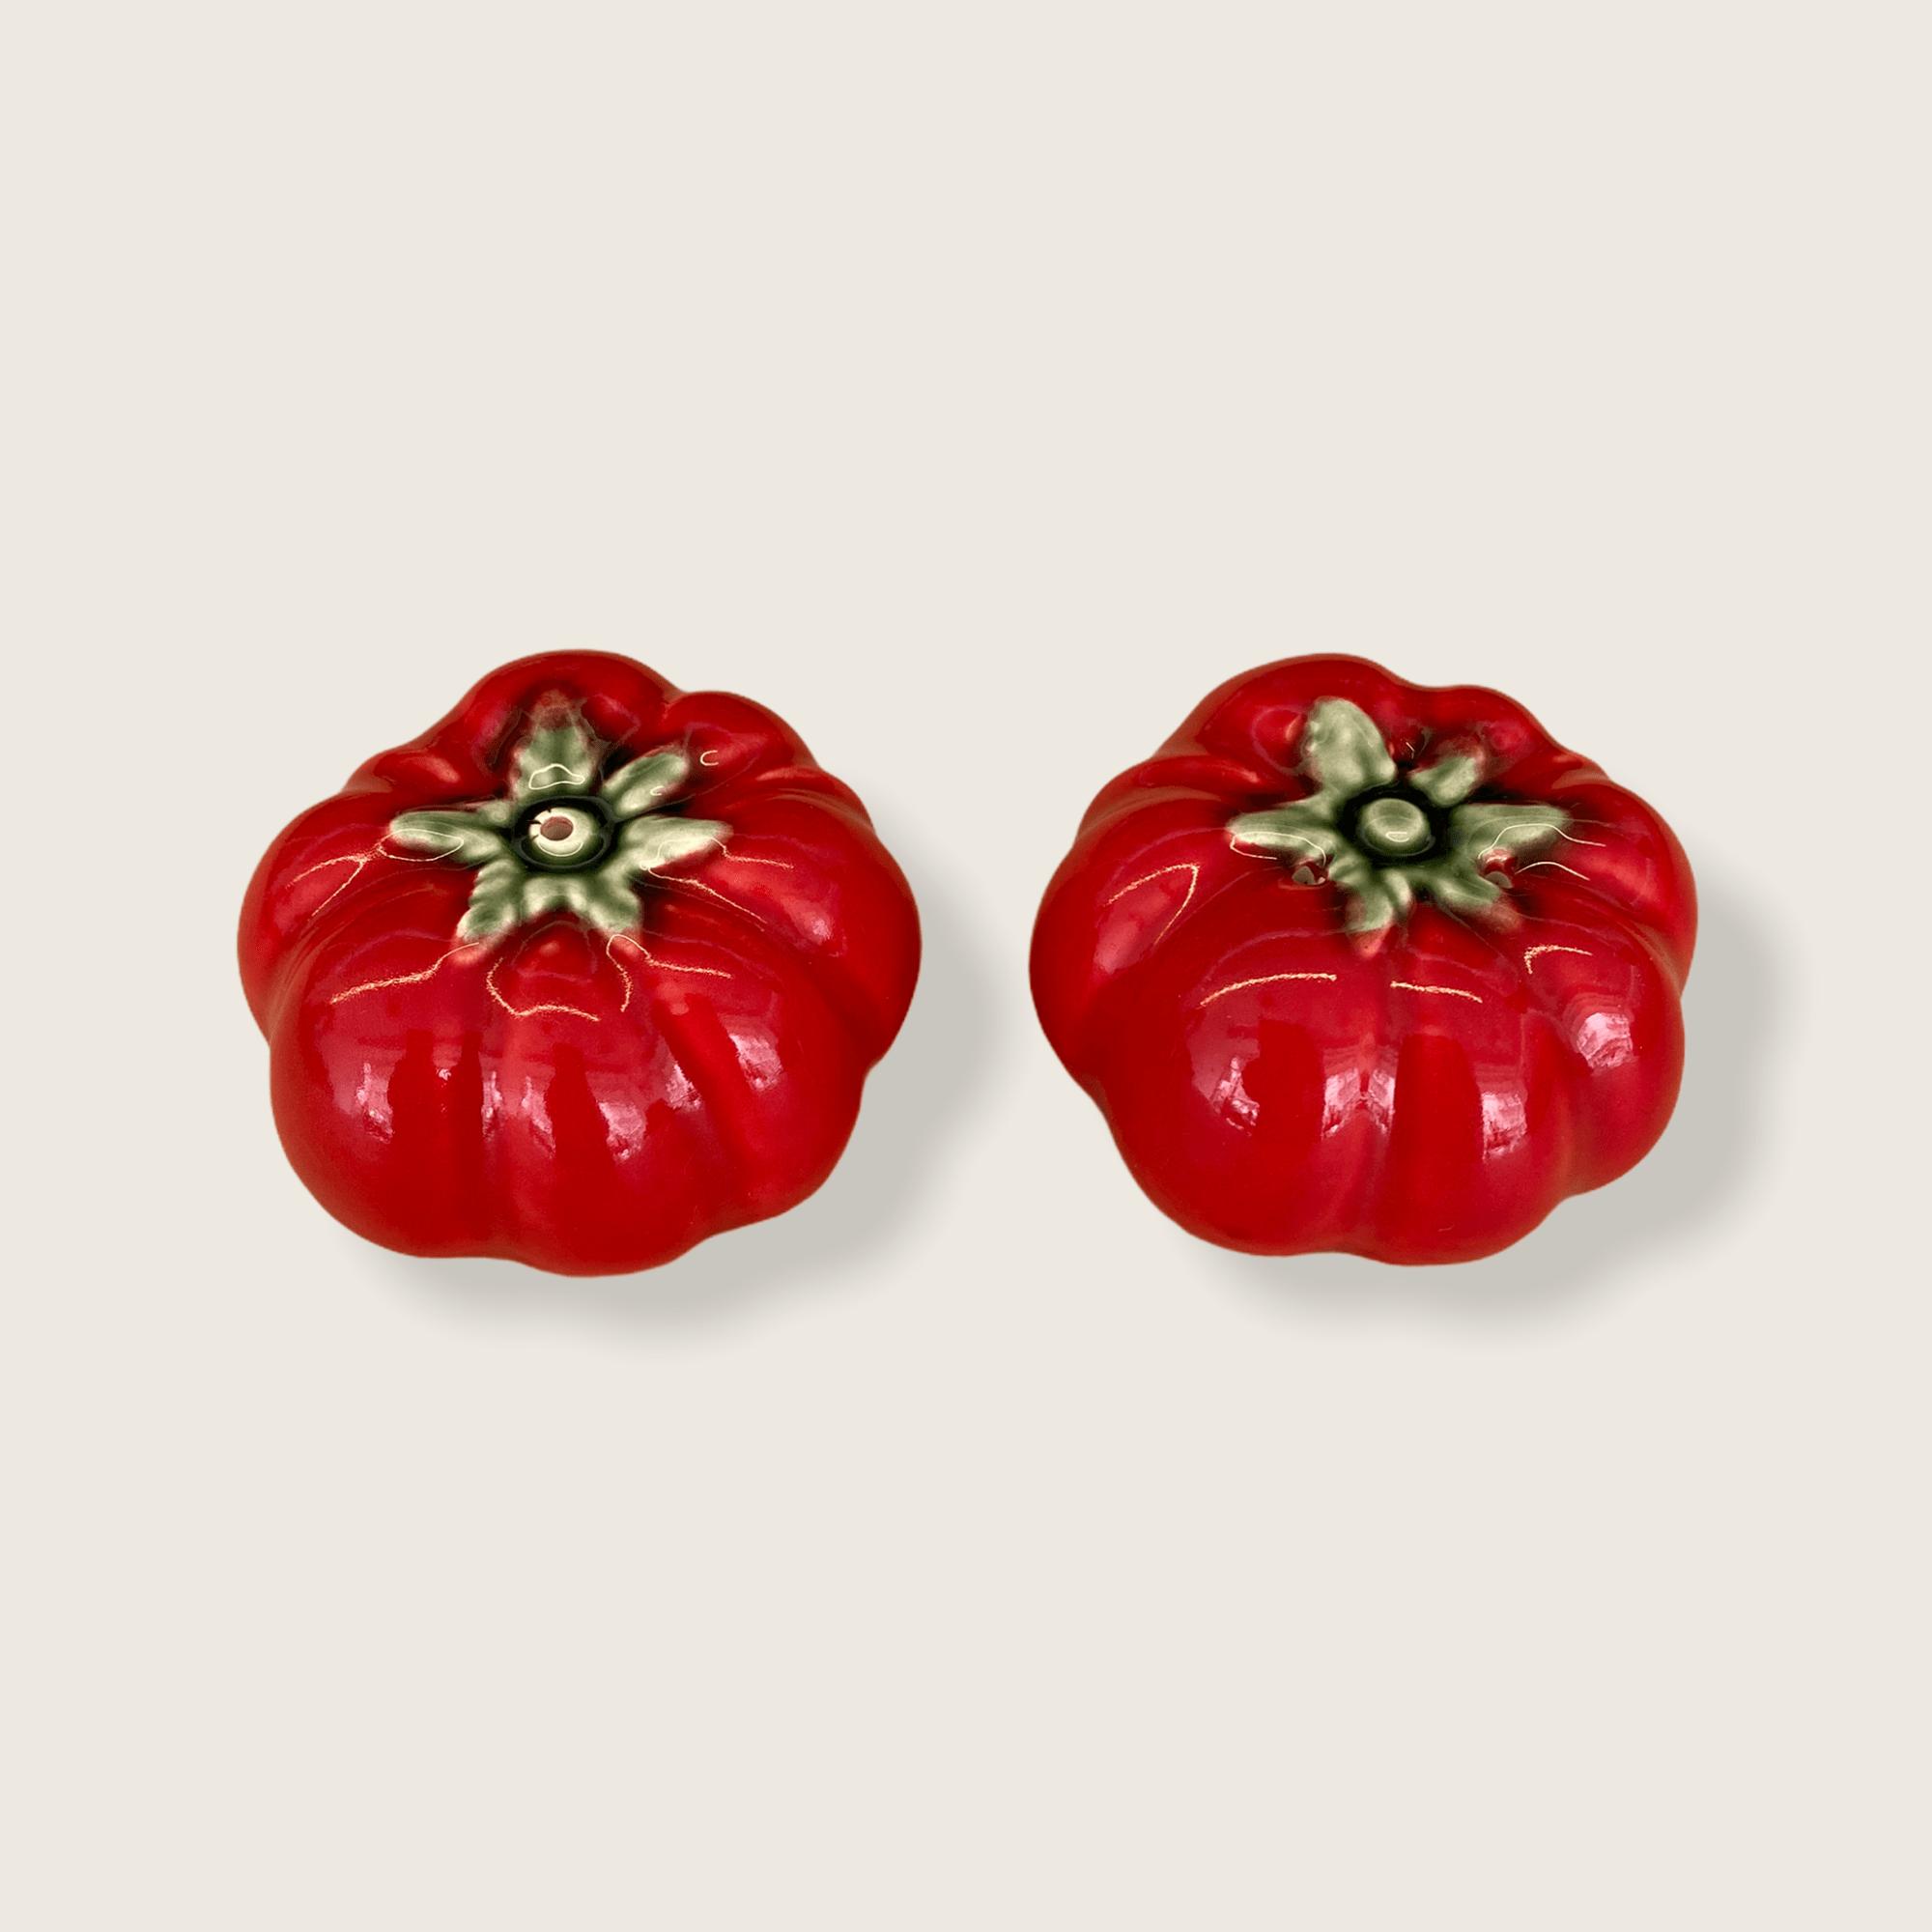 Tomato (salt and pepper)